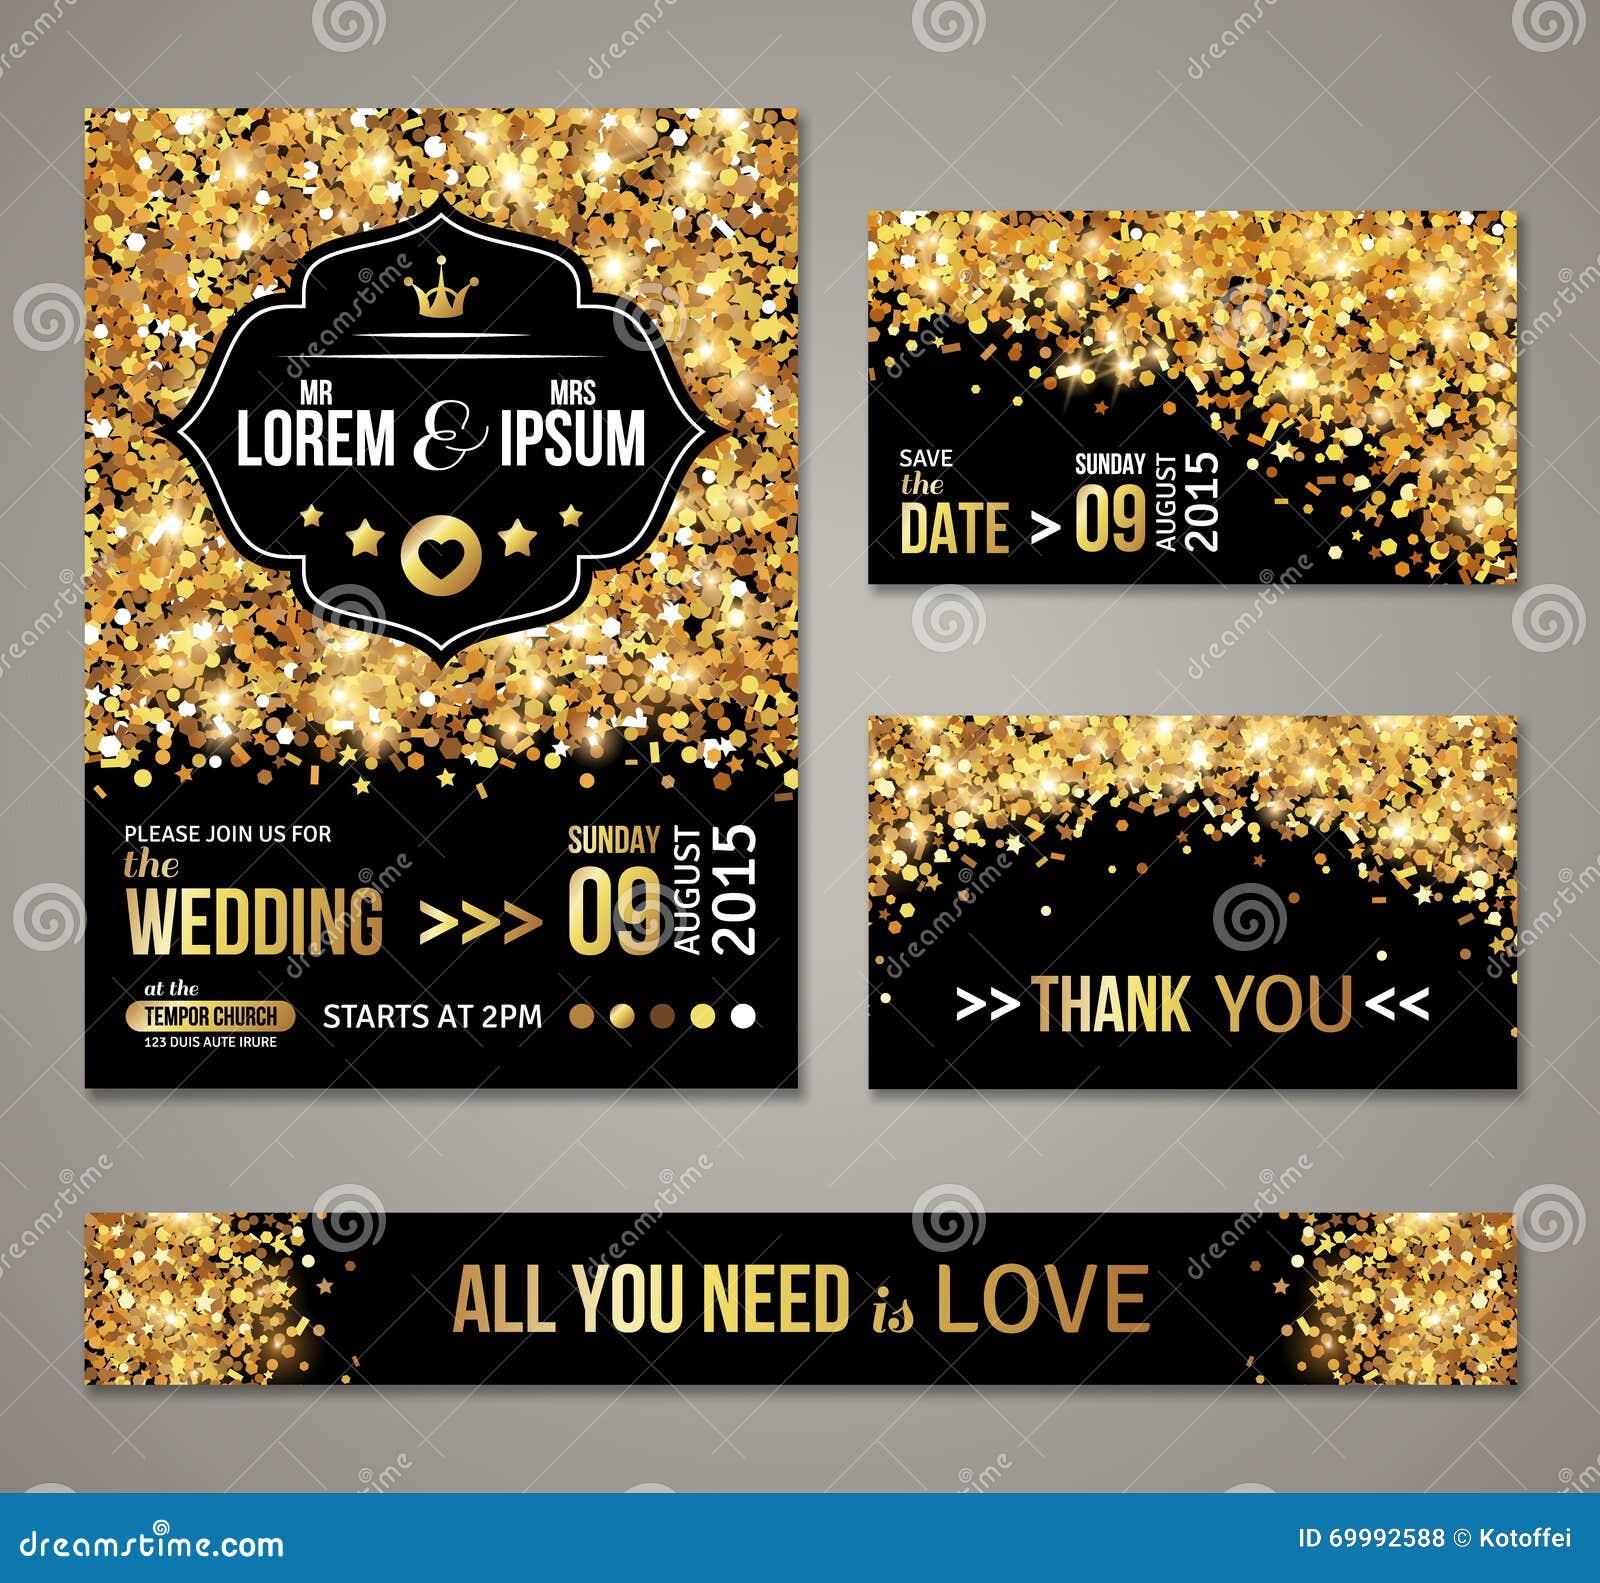 Wedding Invitation Gold Confetti And Black Background Stock Vector Illustration Of Glittering Elegant 69992588